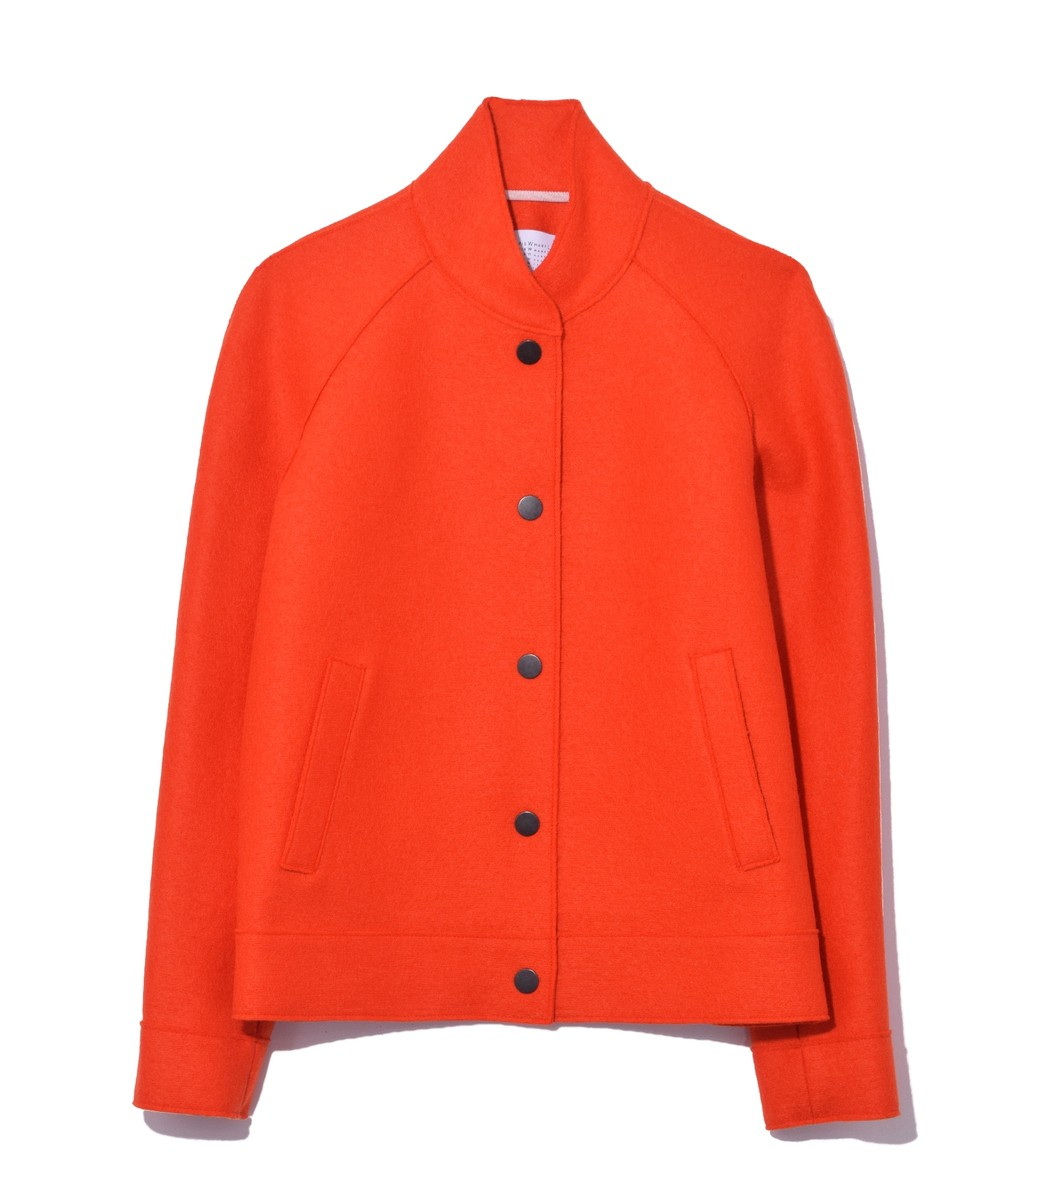 HARRIS WHARF Bright Orange Bomber Jacket